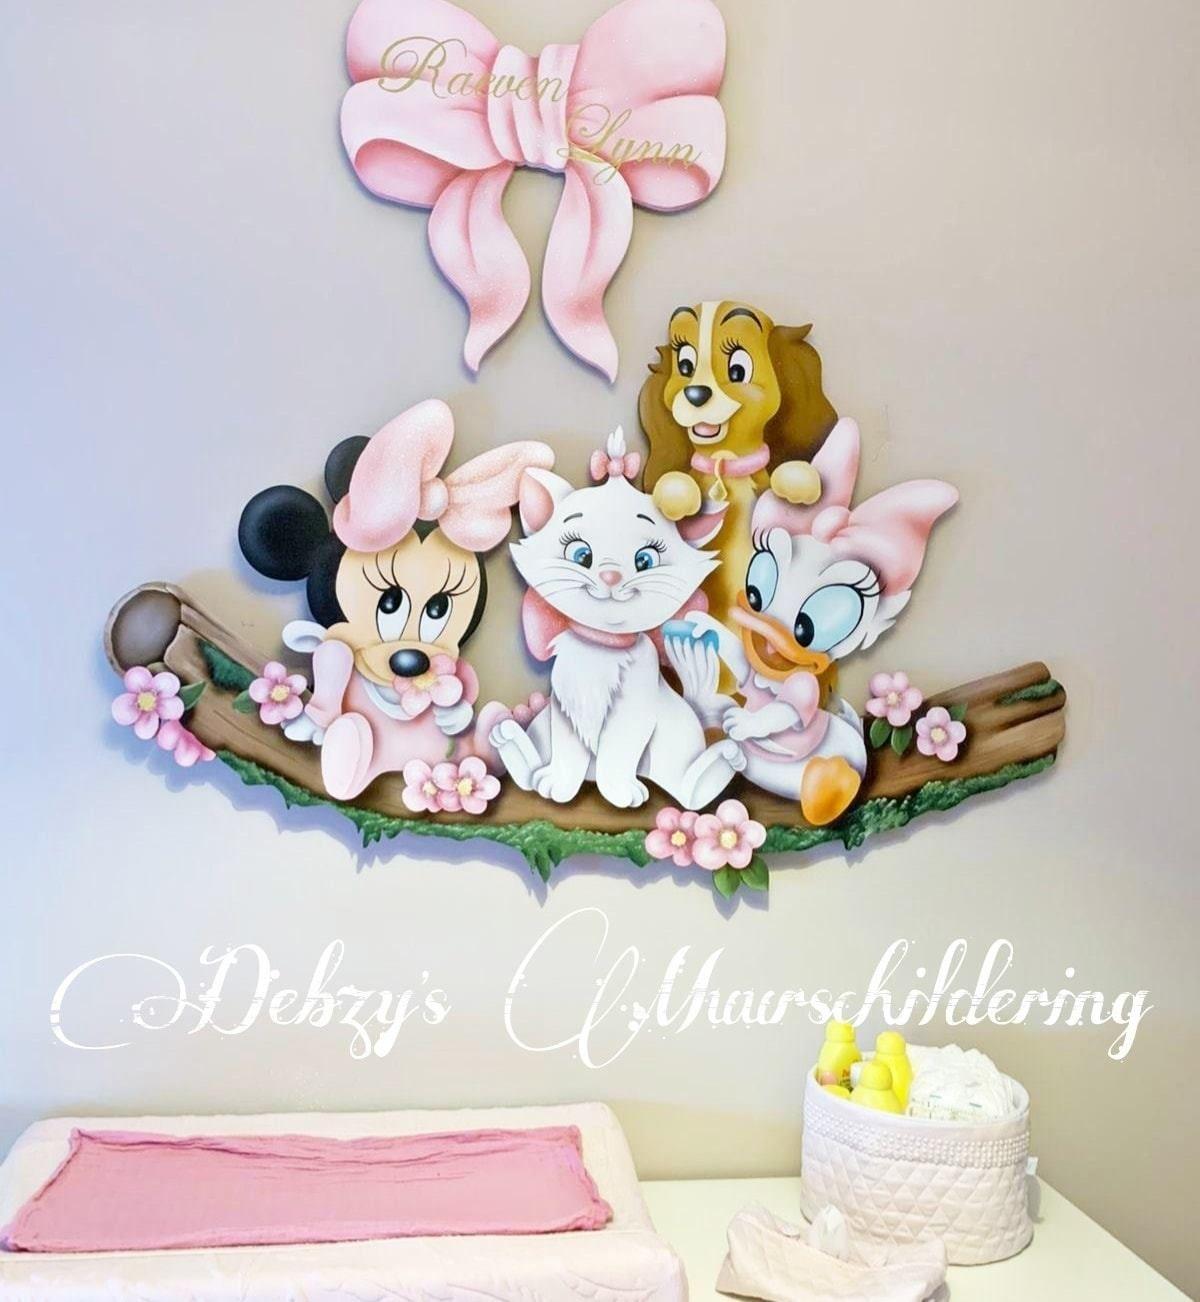 Baby Minnie En Katrien Marie En Lady Paneel Babykamer Decoratie Babykamer Muurschildering Baby Meisje Kamer